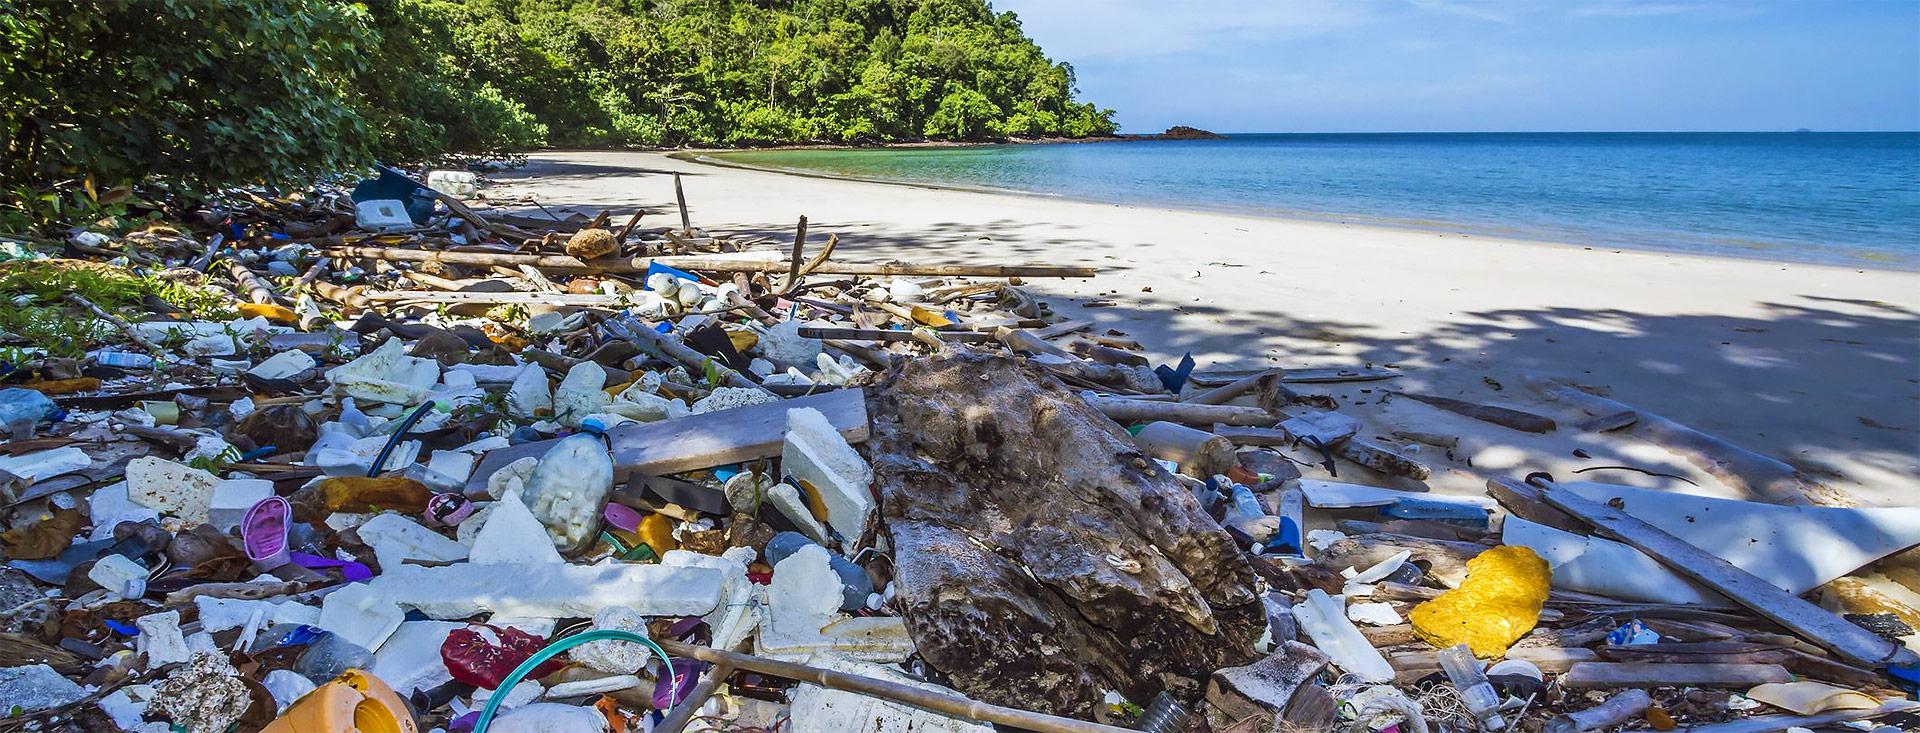 Фантастика из пластика: Сколько ни Броди по берегам Австралии…